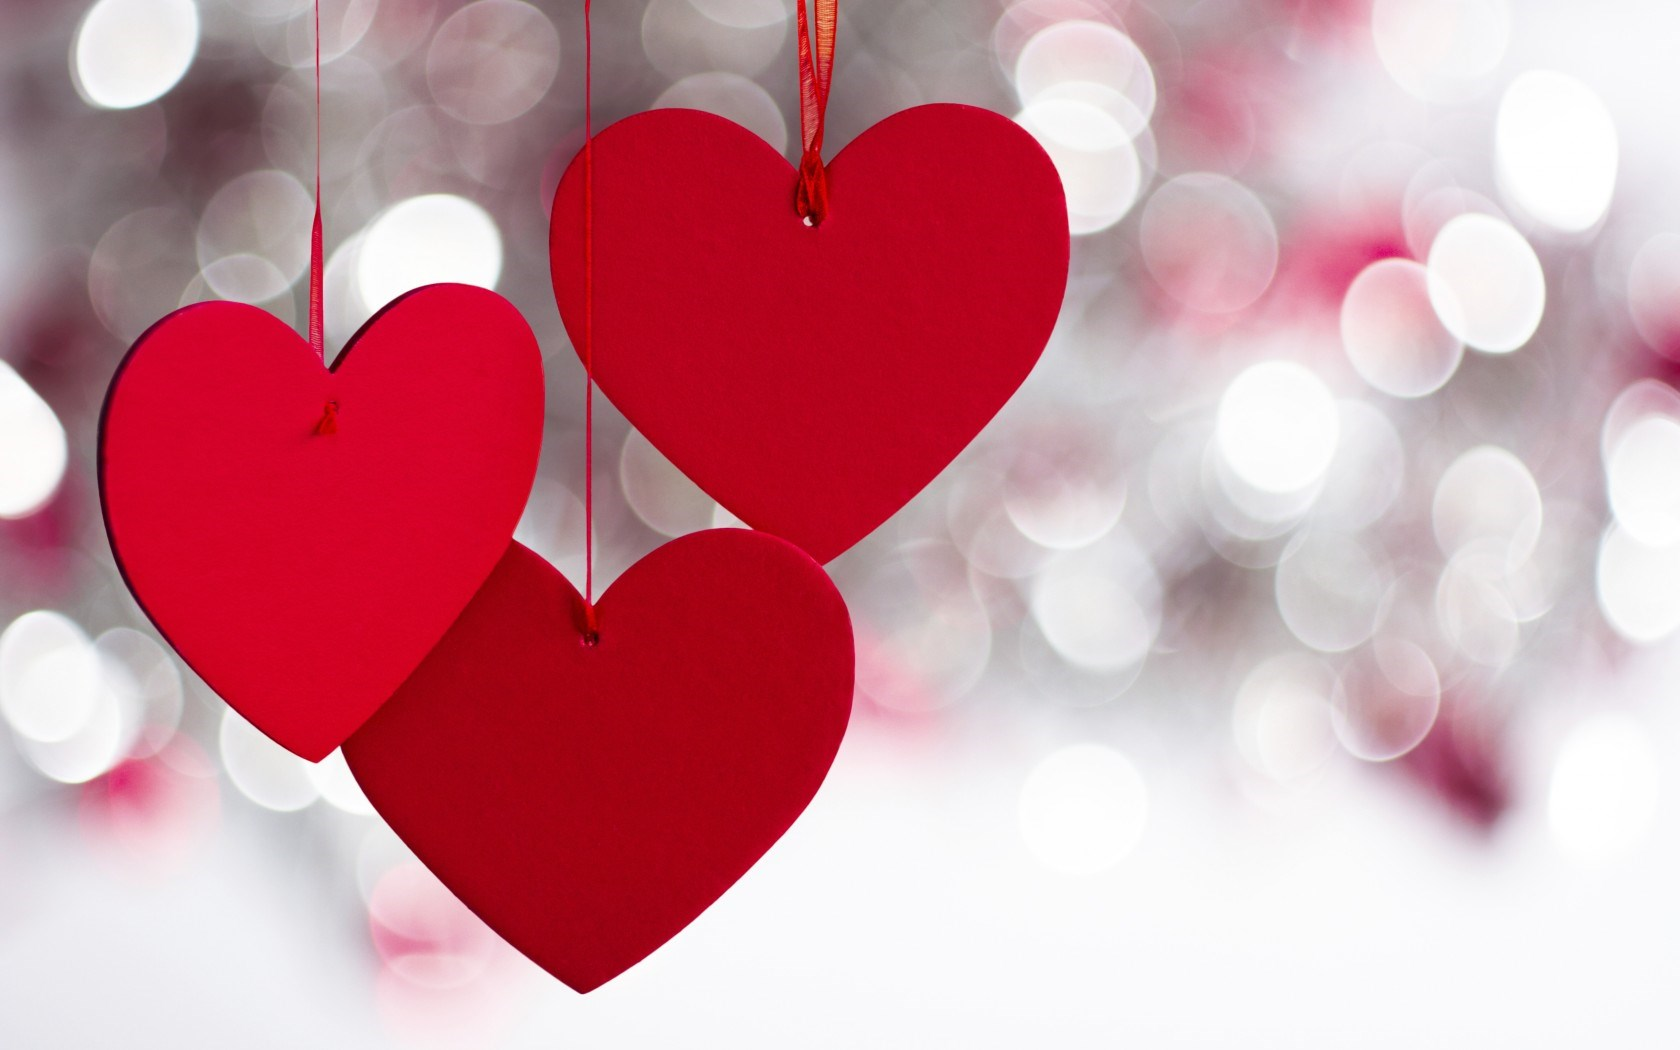 Heart Wallpaper 13 Author Love 1680x1050